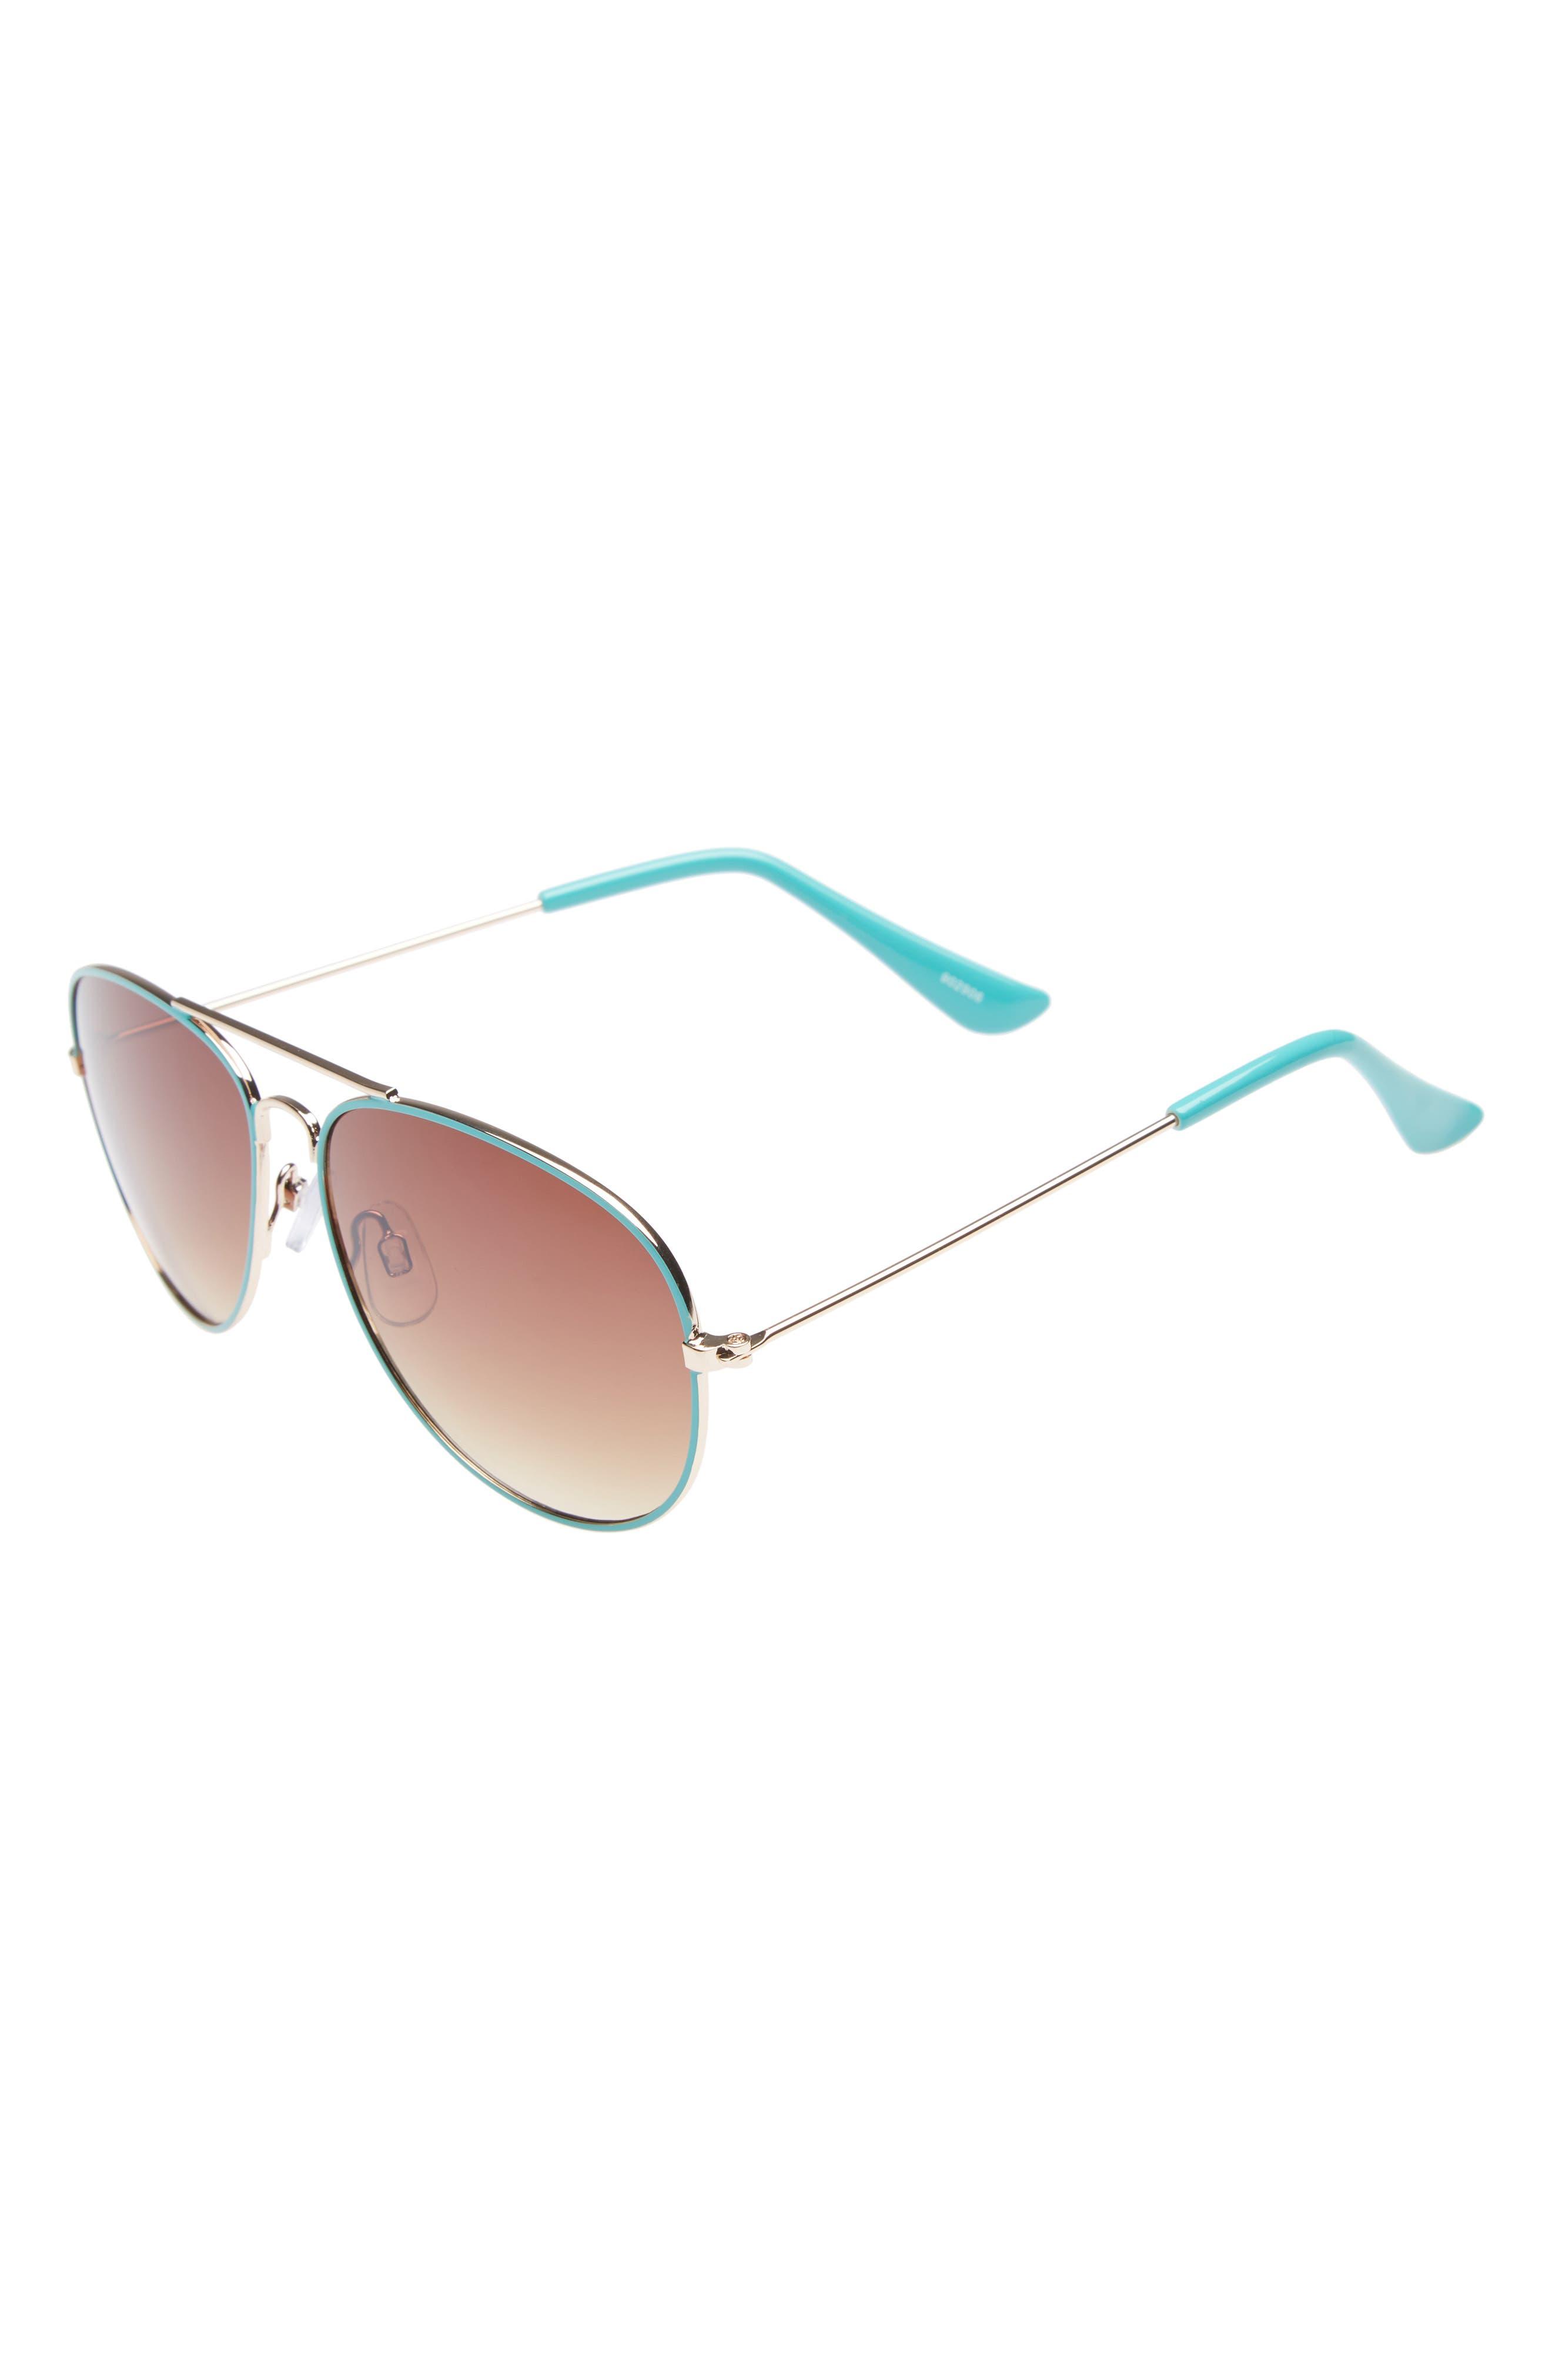 Aviator Sunglasses,                         Main,                         color, Gold